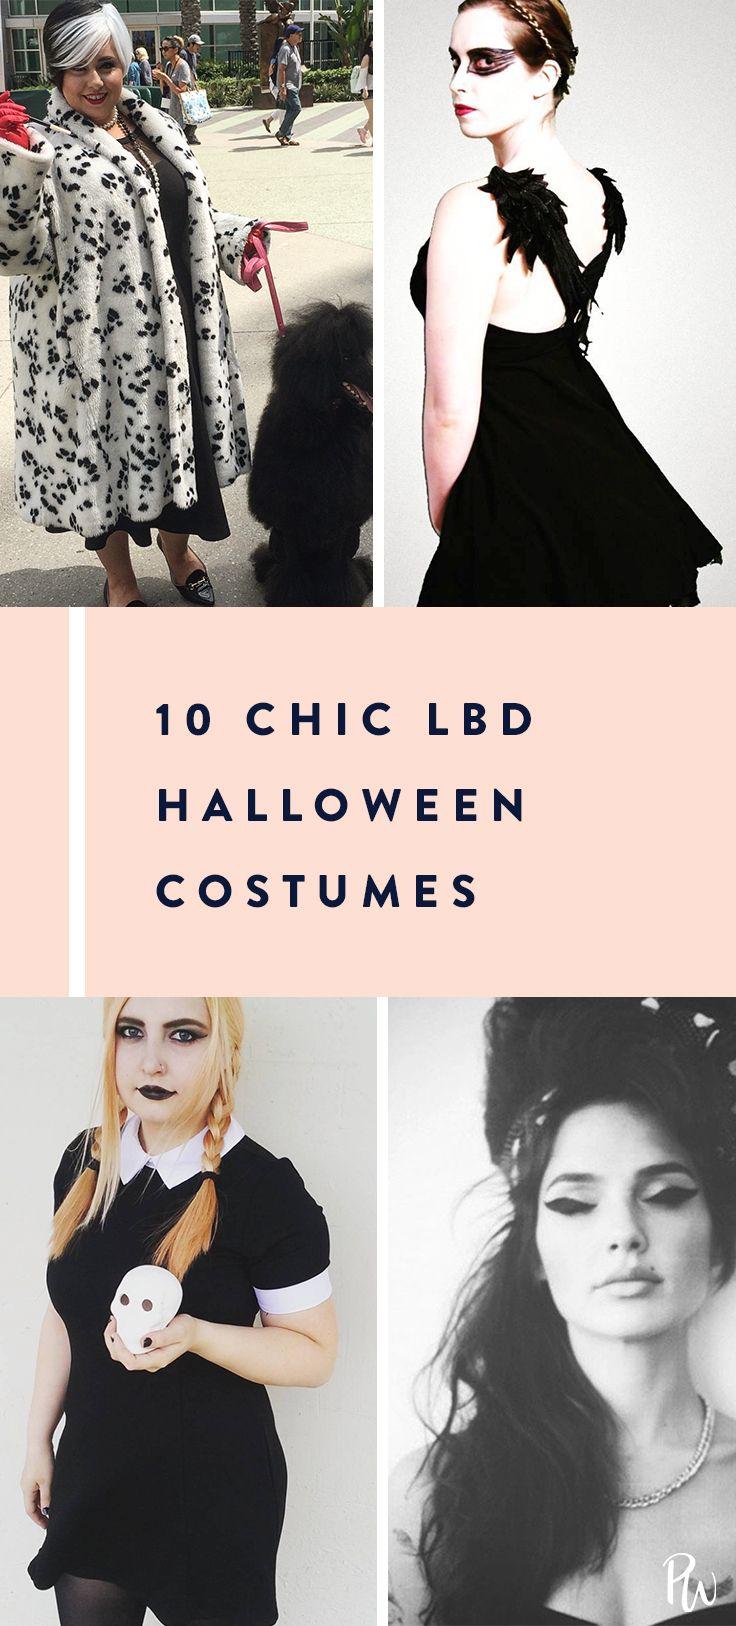 21 Chic, Little Black Dress Halloween Costume Ideas  Black dress